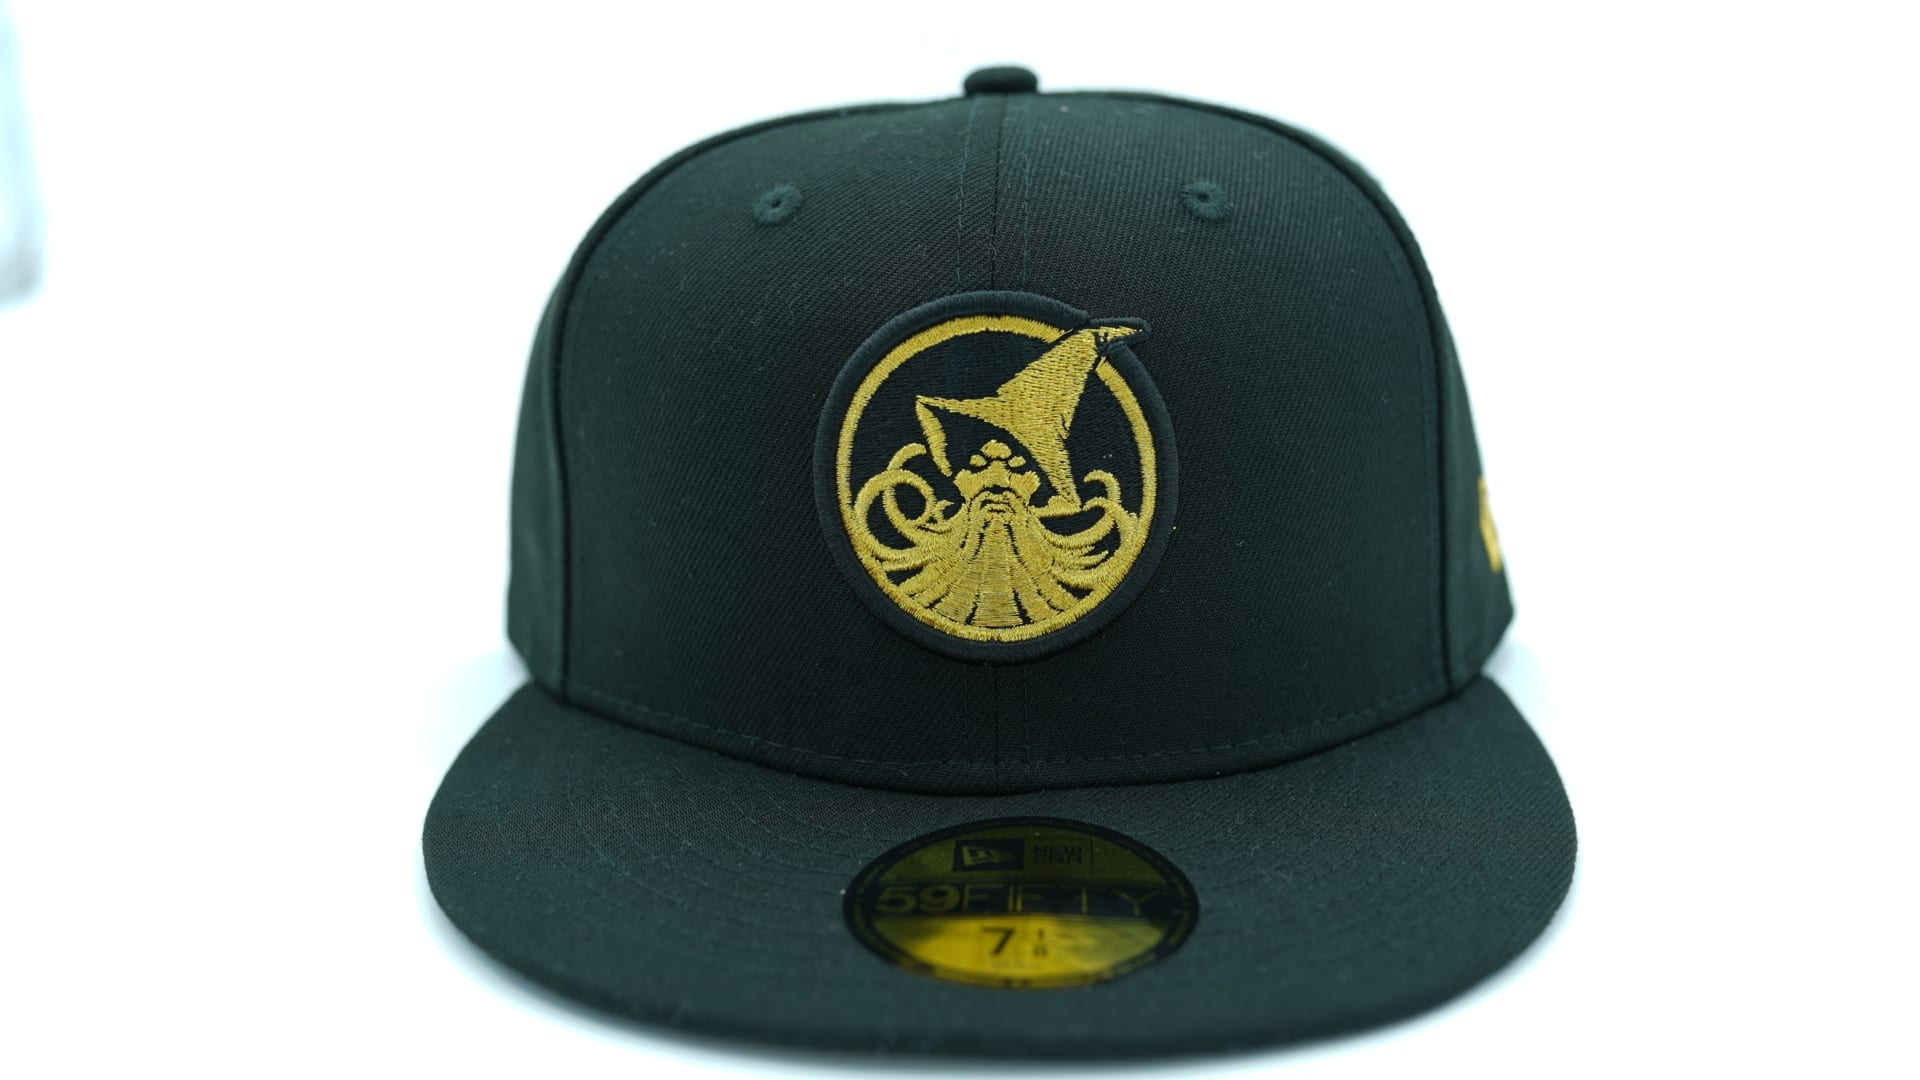 3a8e7e8e999418 NBA Logo Camo Visor 59Fifty Fitted Baseball Cap by NEW ERA x NBA ...